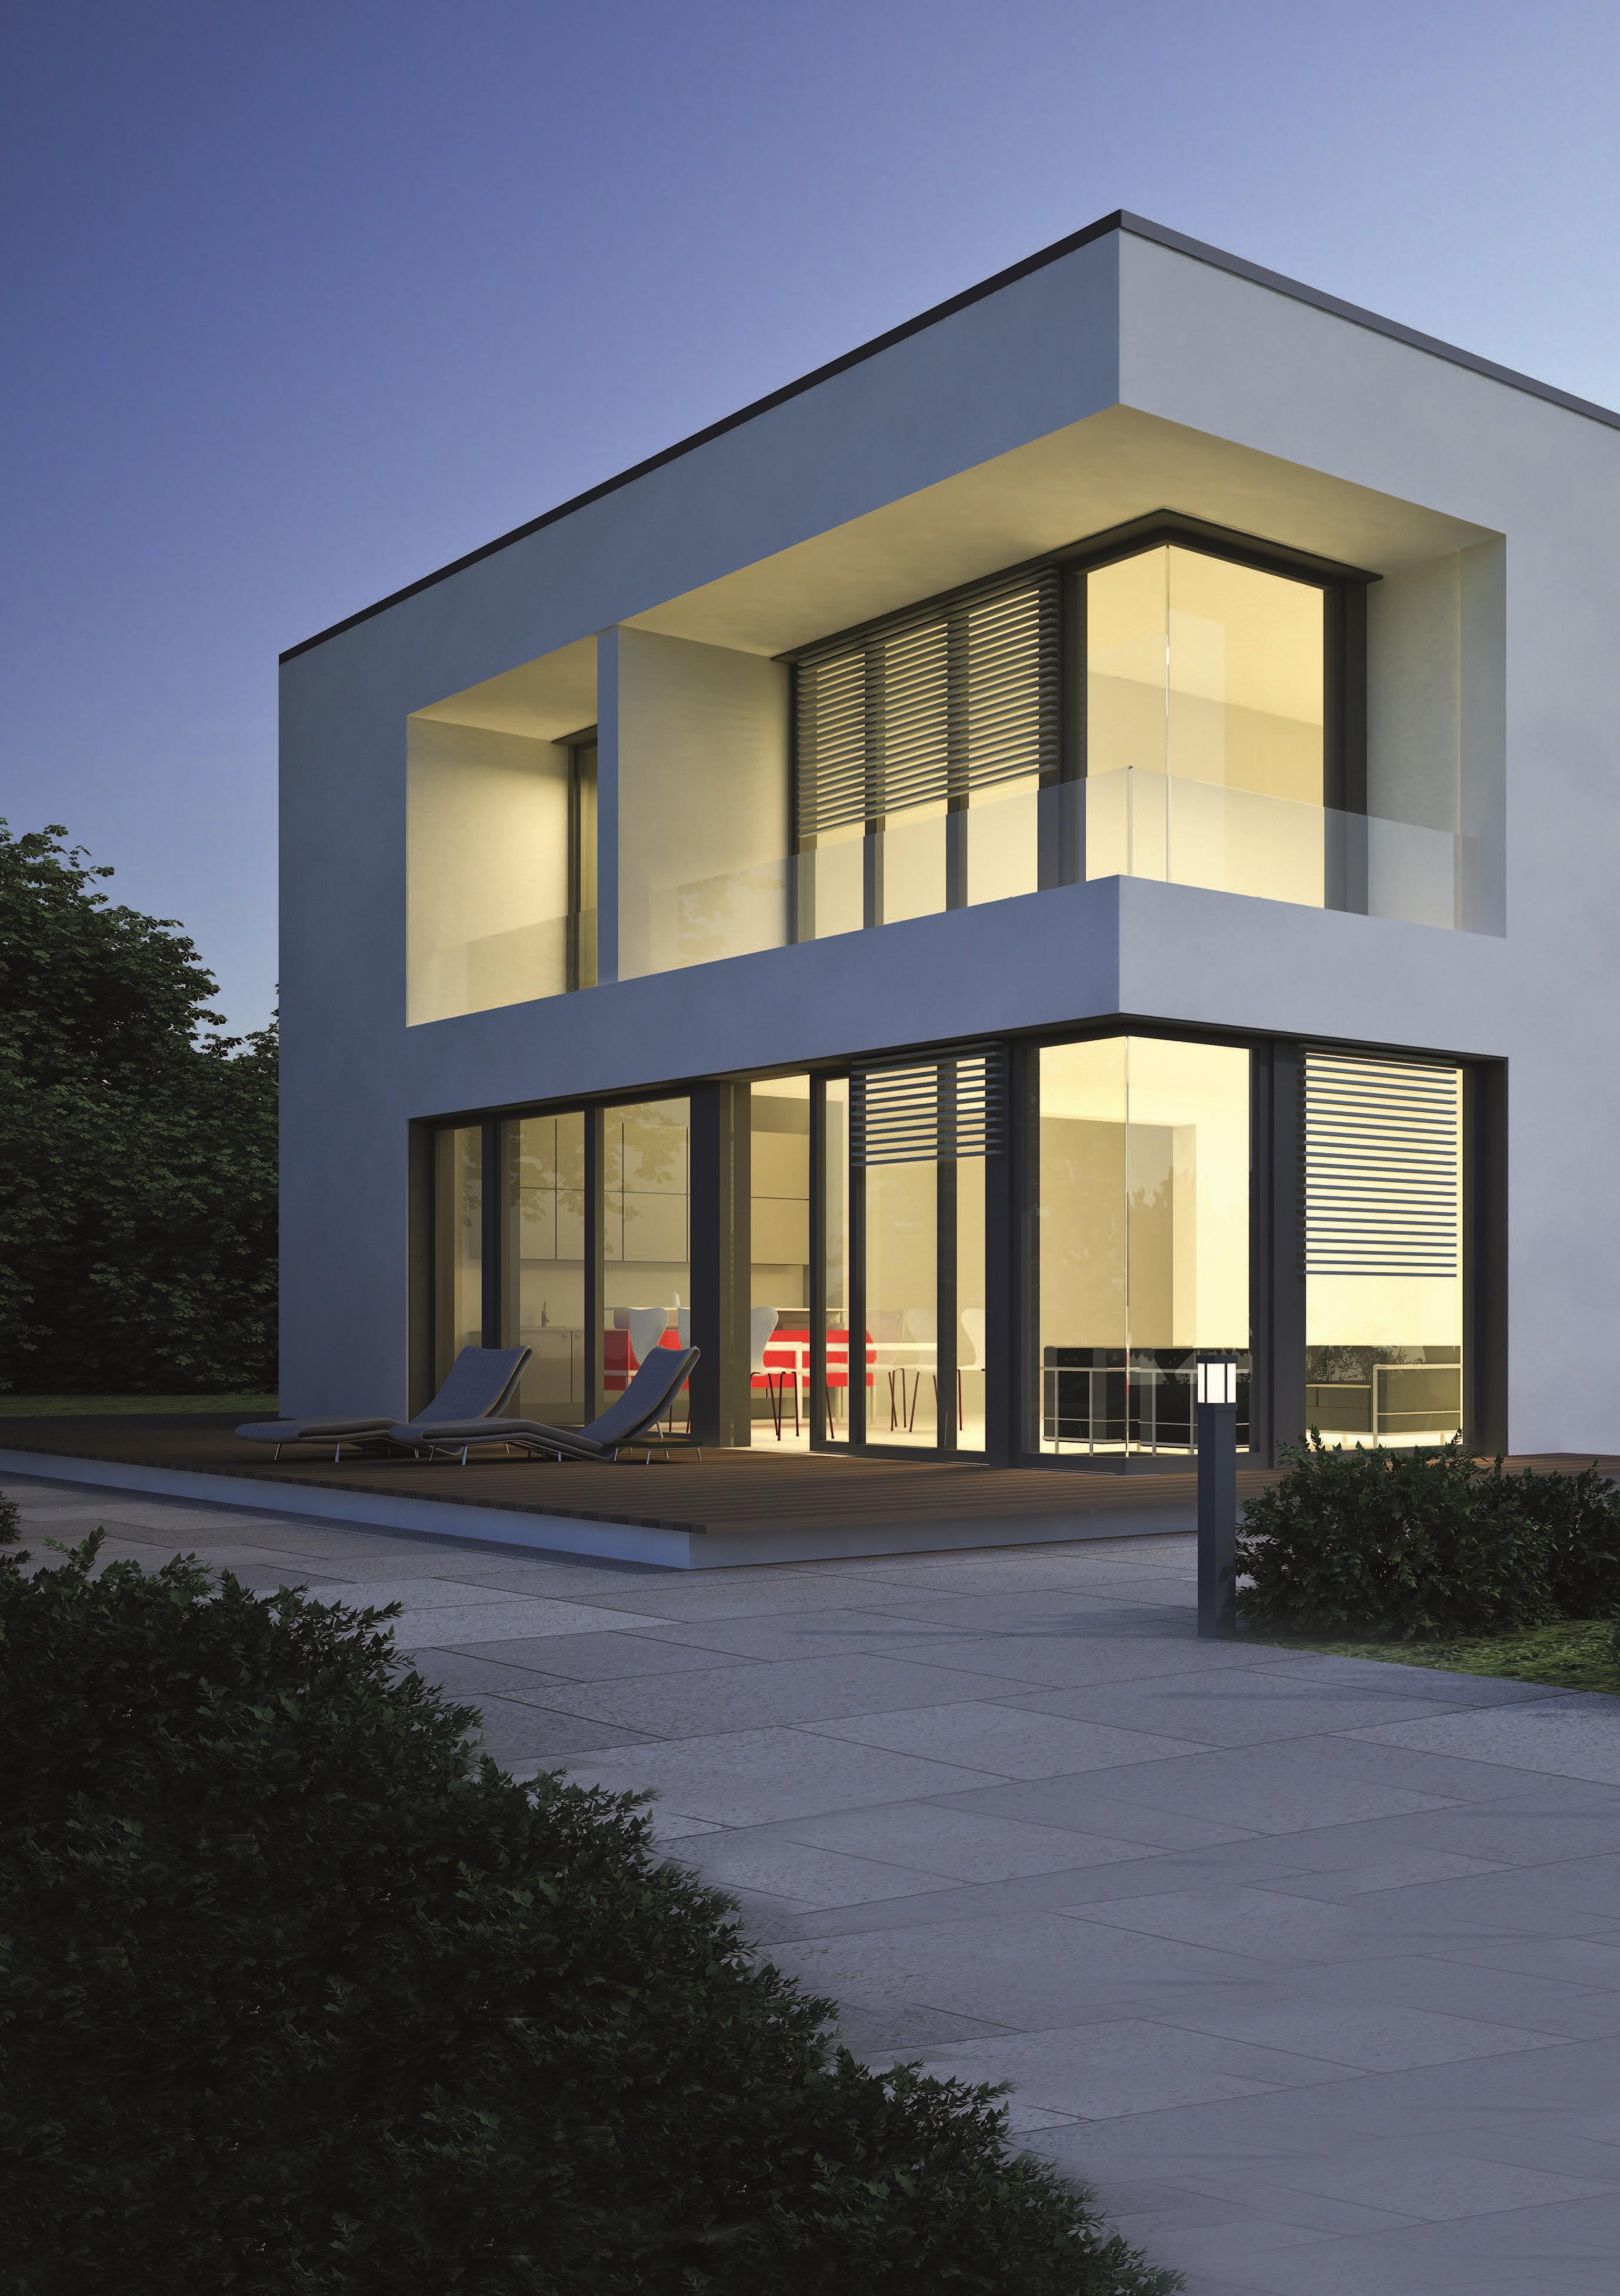 Holzfenster modern  HOLZFENSTER MODERN | Müller & Sohn Fensterfabrik